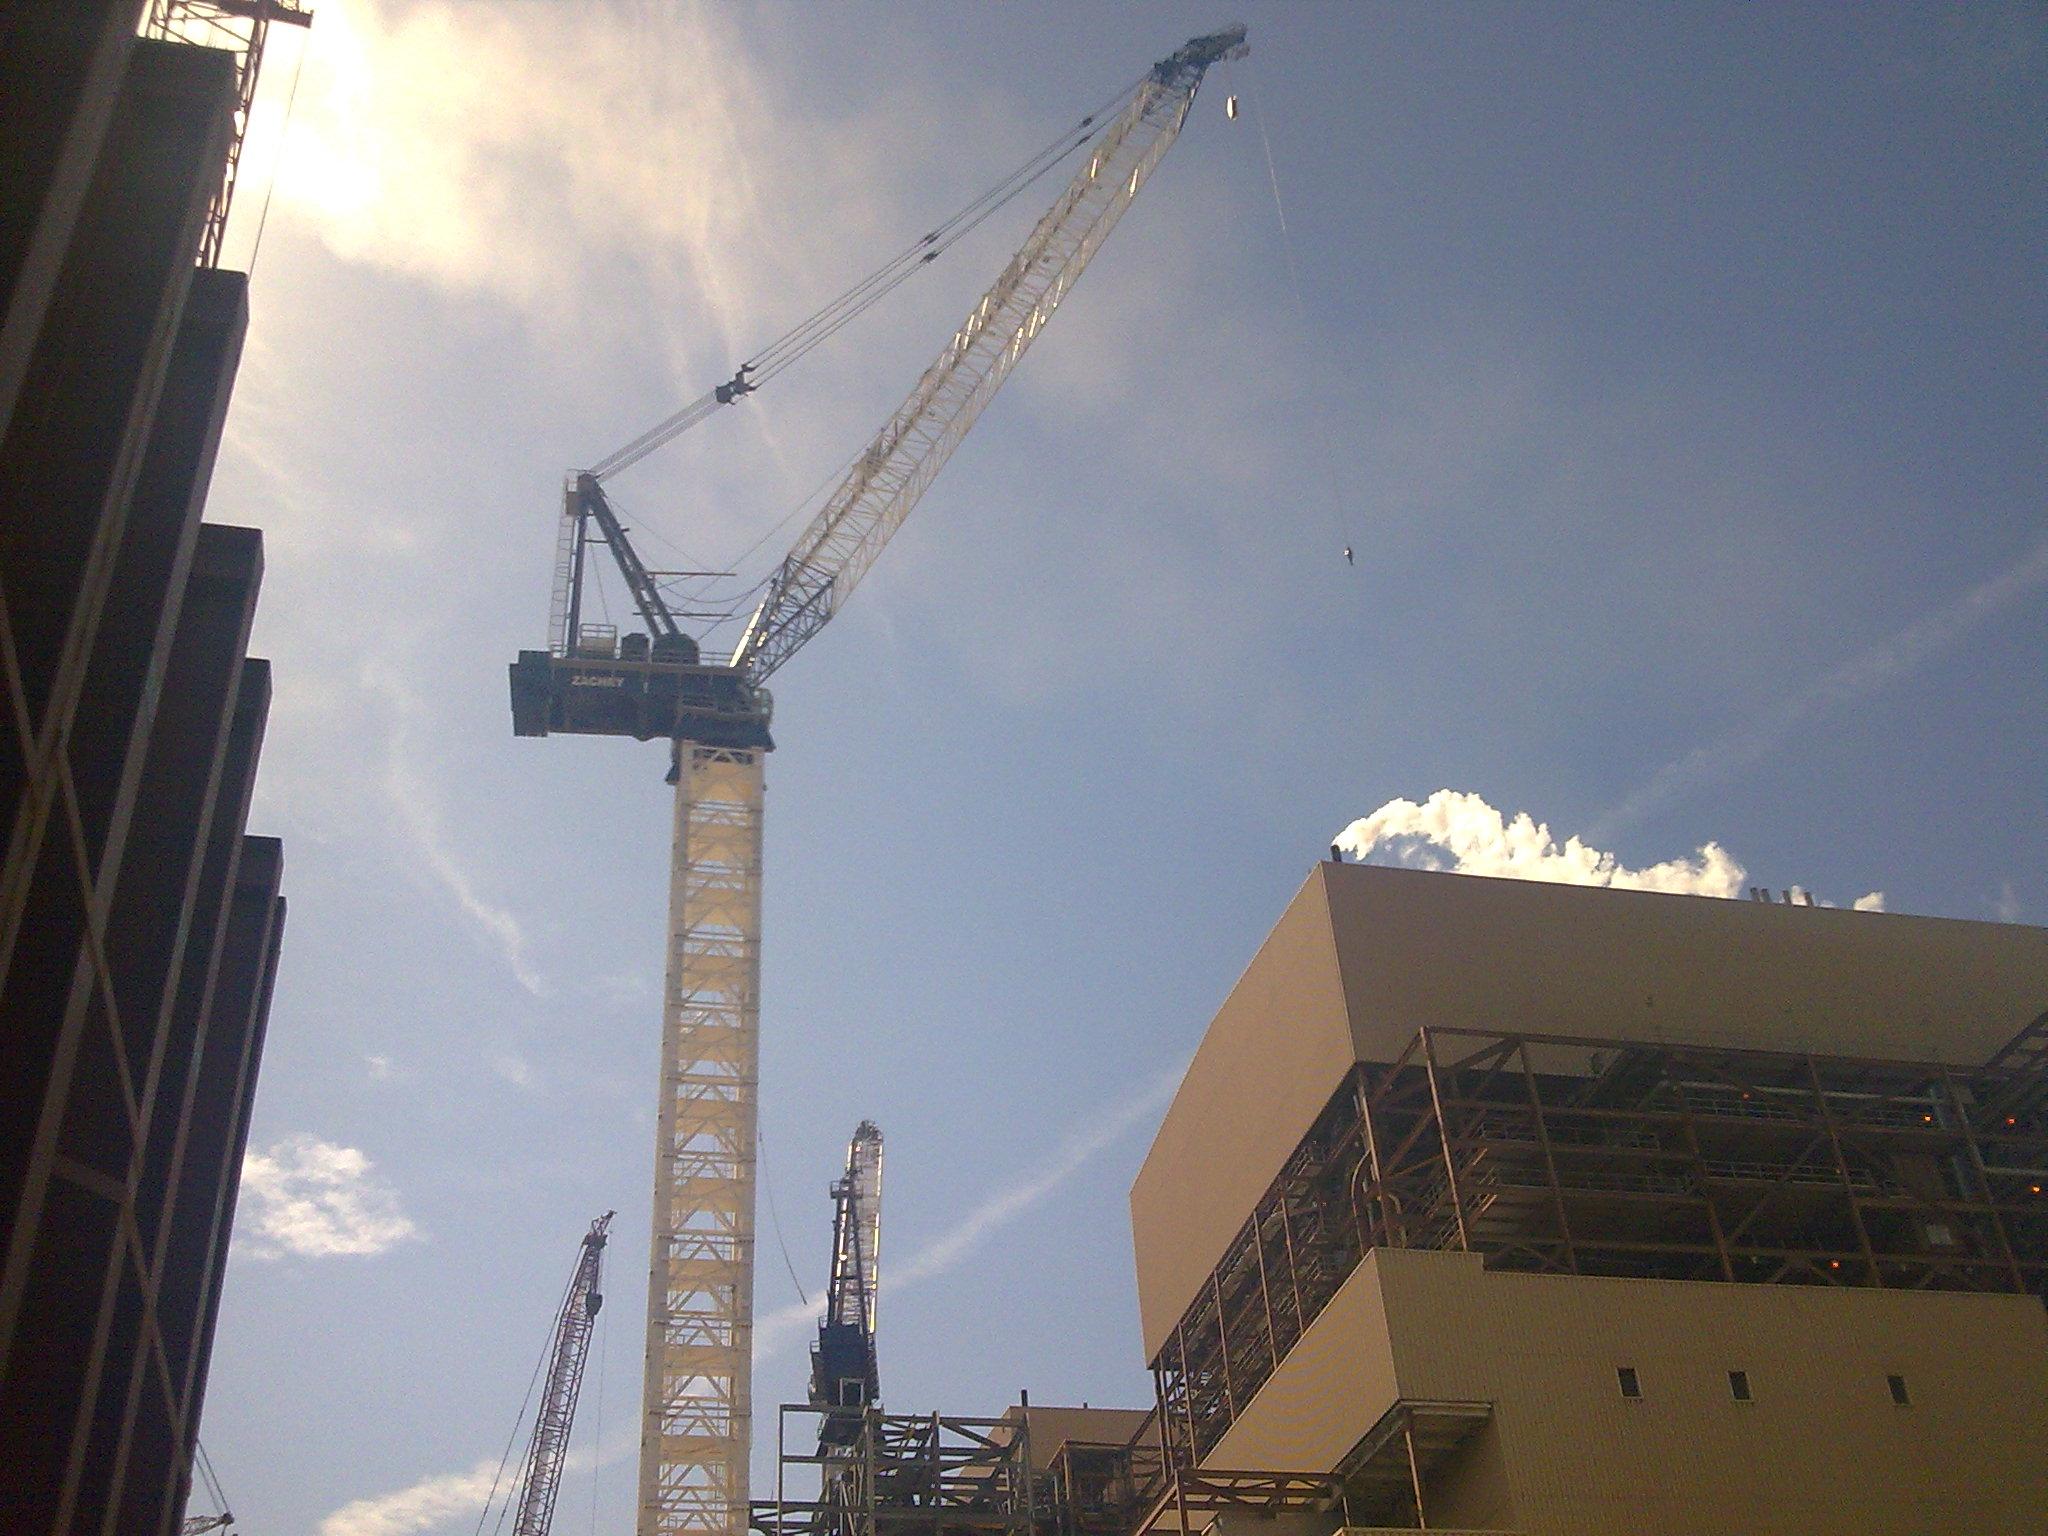 Lomma Crane Amp Rigging Cranes For Sale Crane Sales